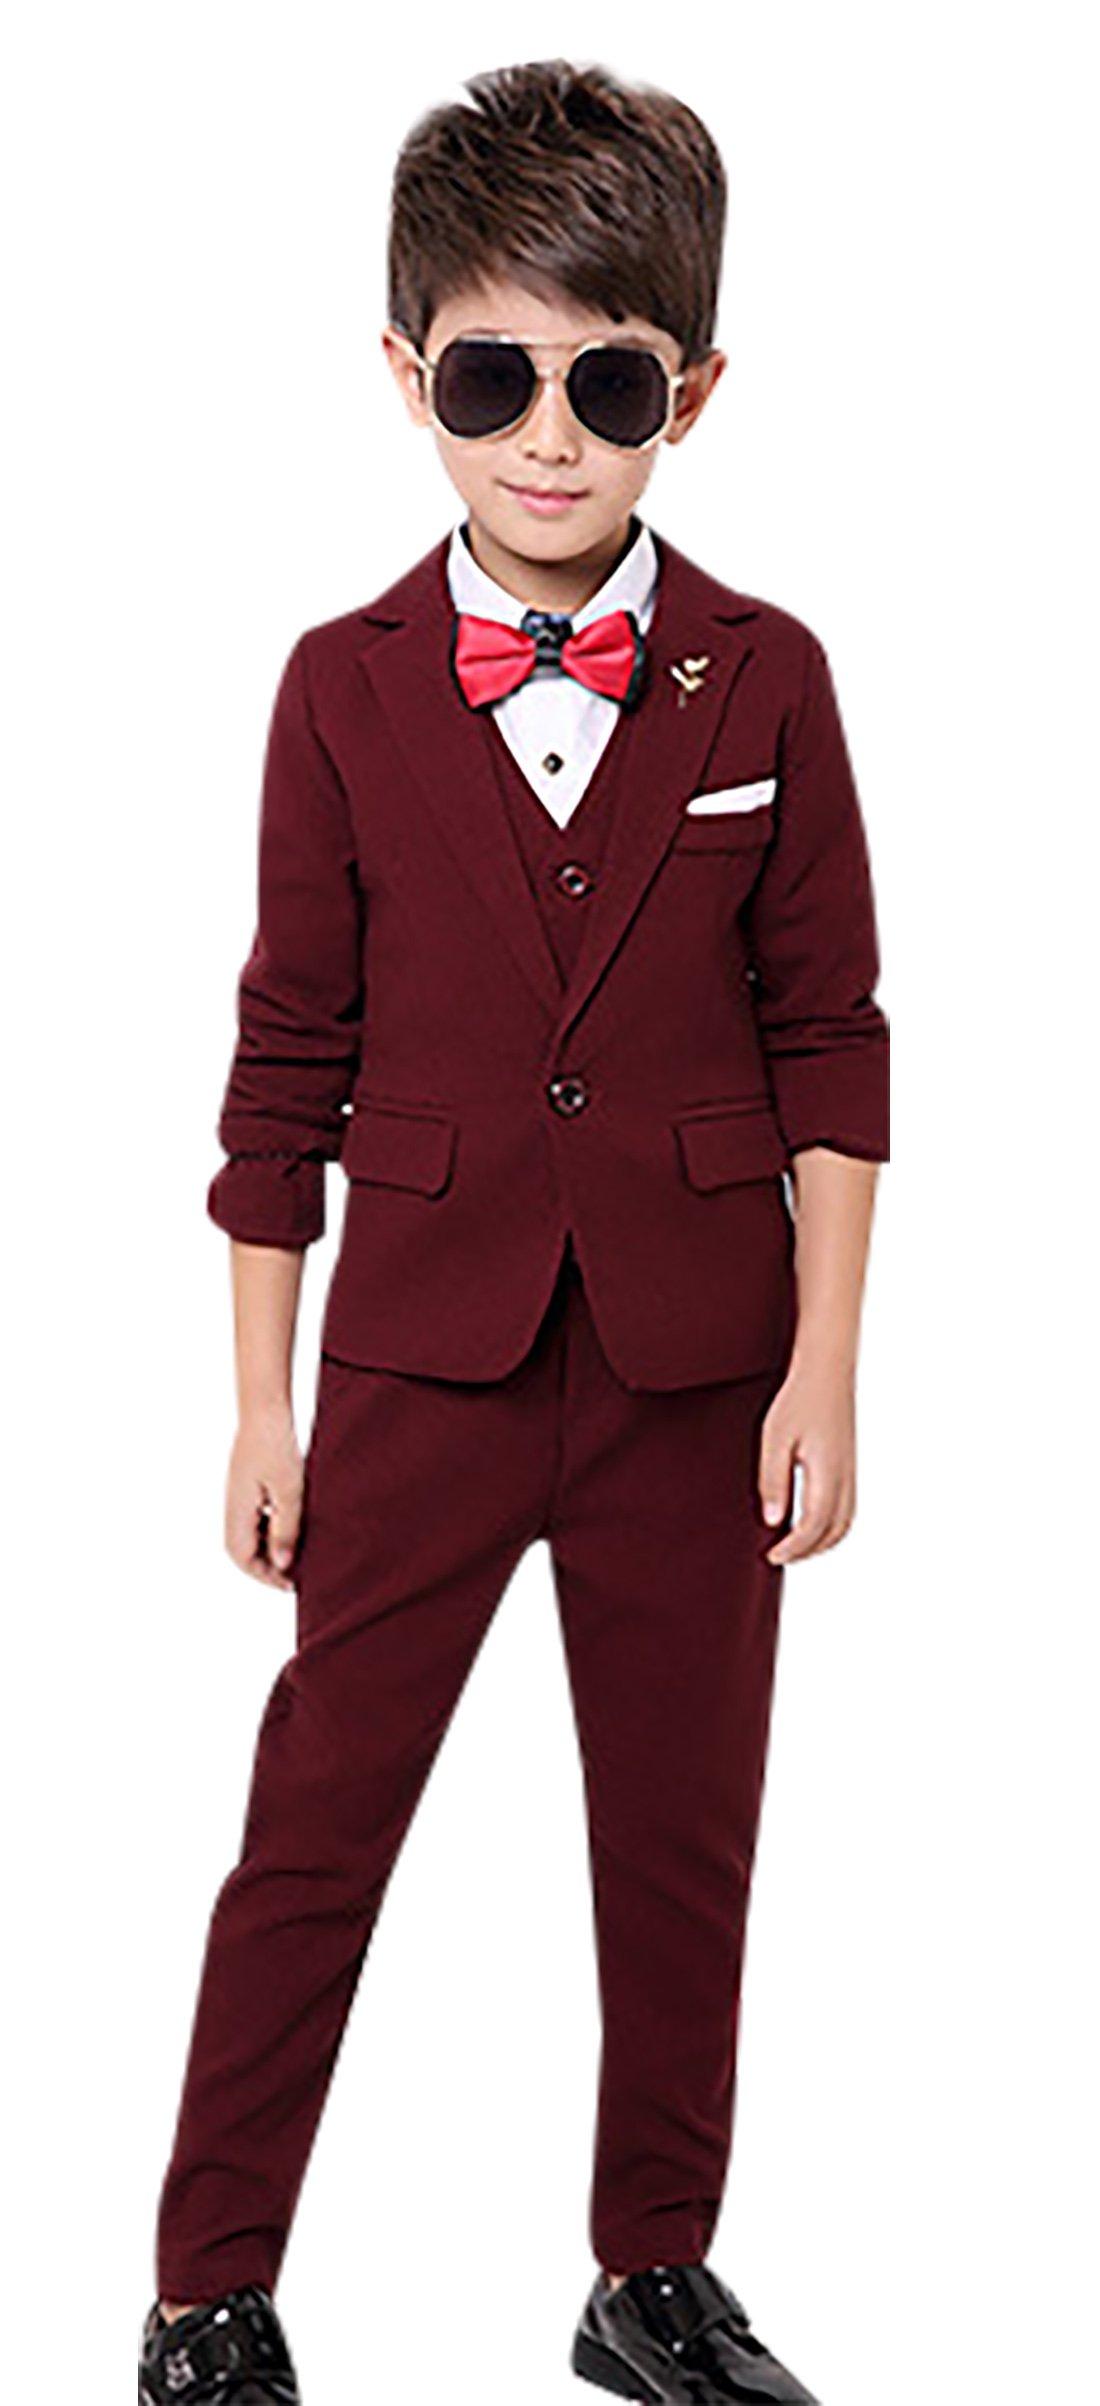 Boys Modern Dress Suit Plaid 3 PCS Formal Wedding Dress Suit Set Single Breasted Tux Suits Set Red Wine 7-8Y